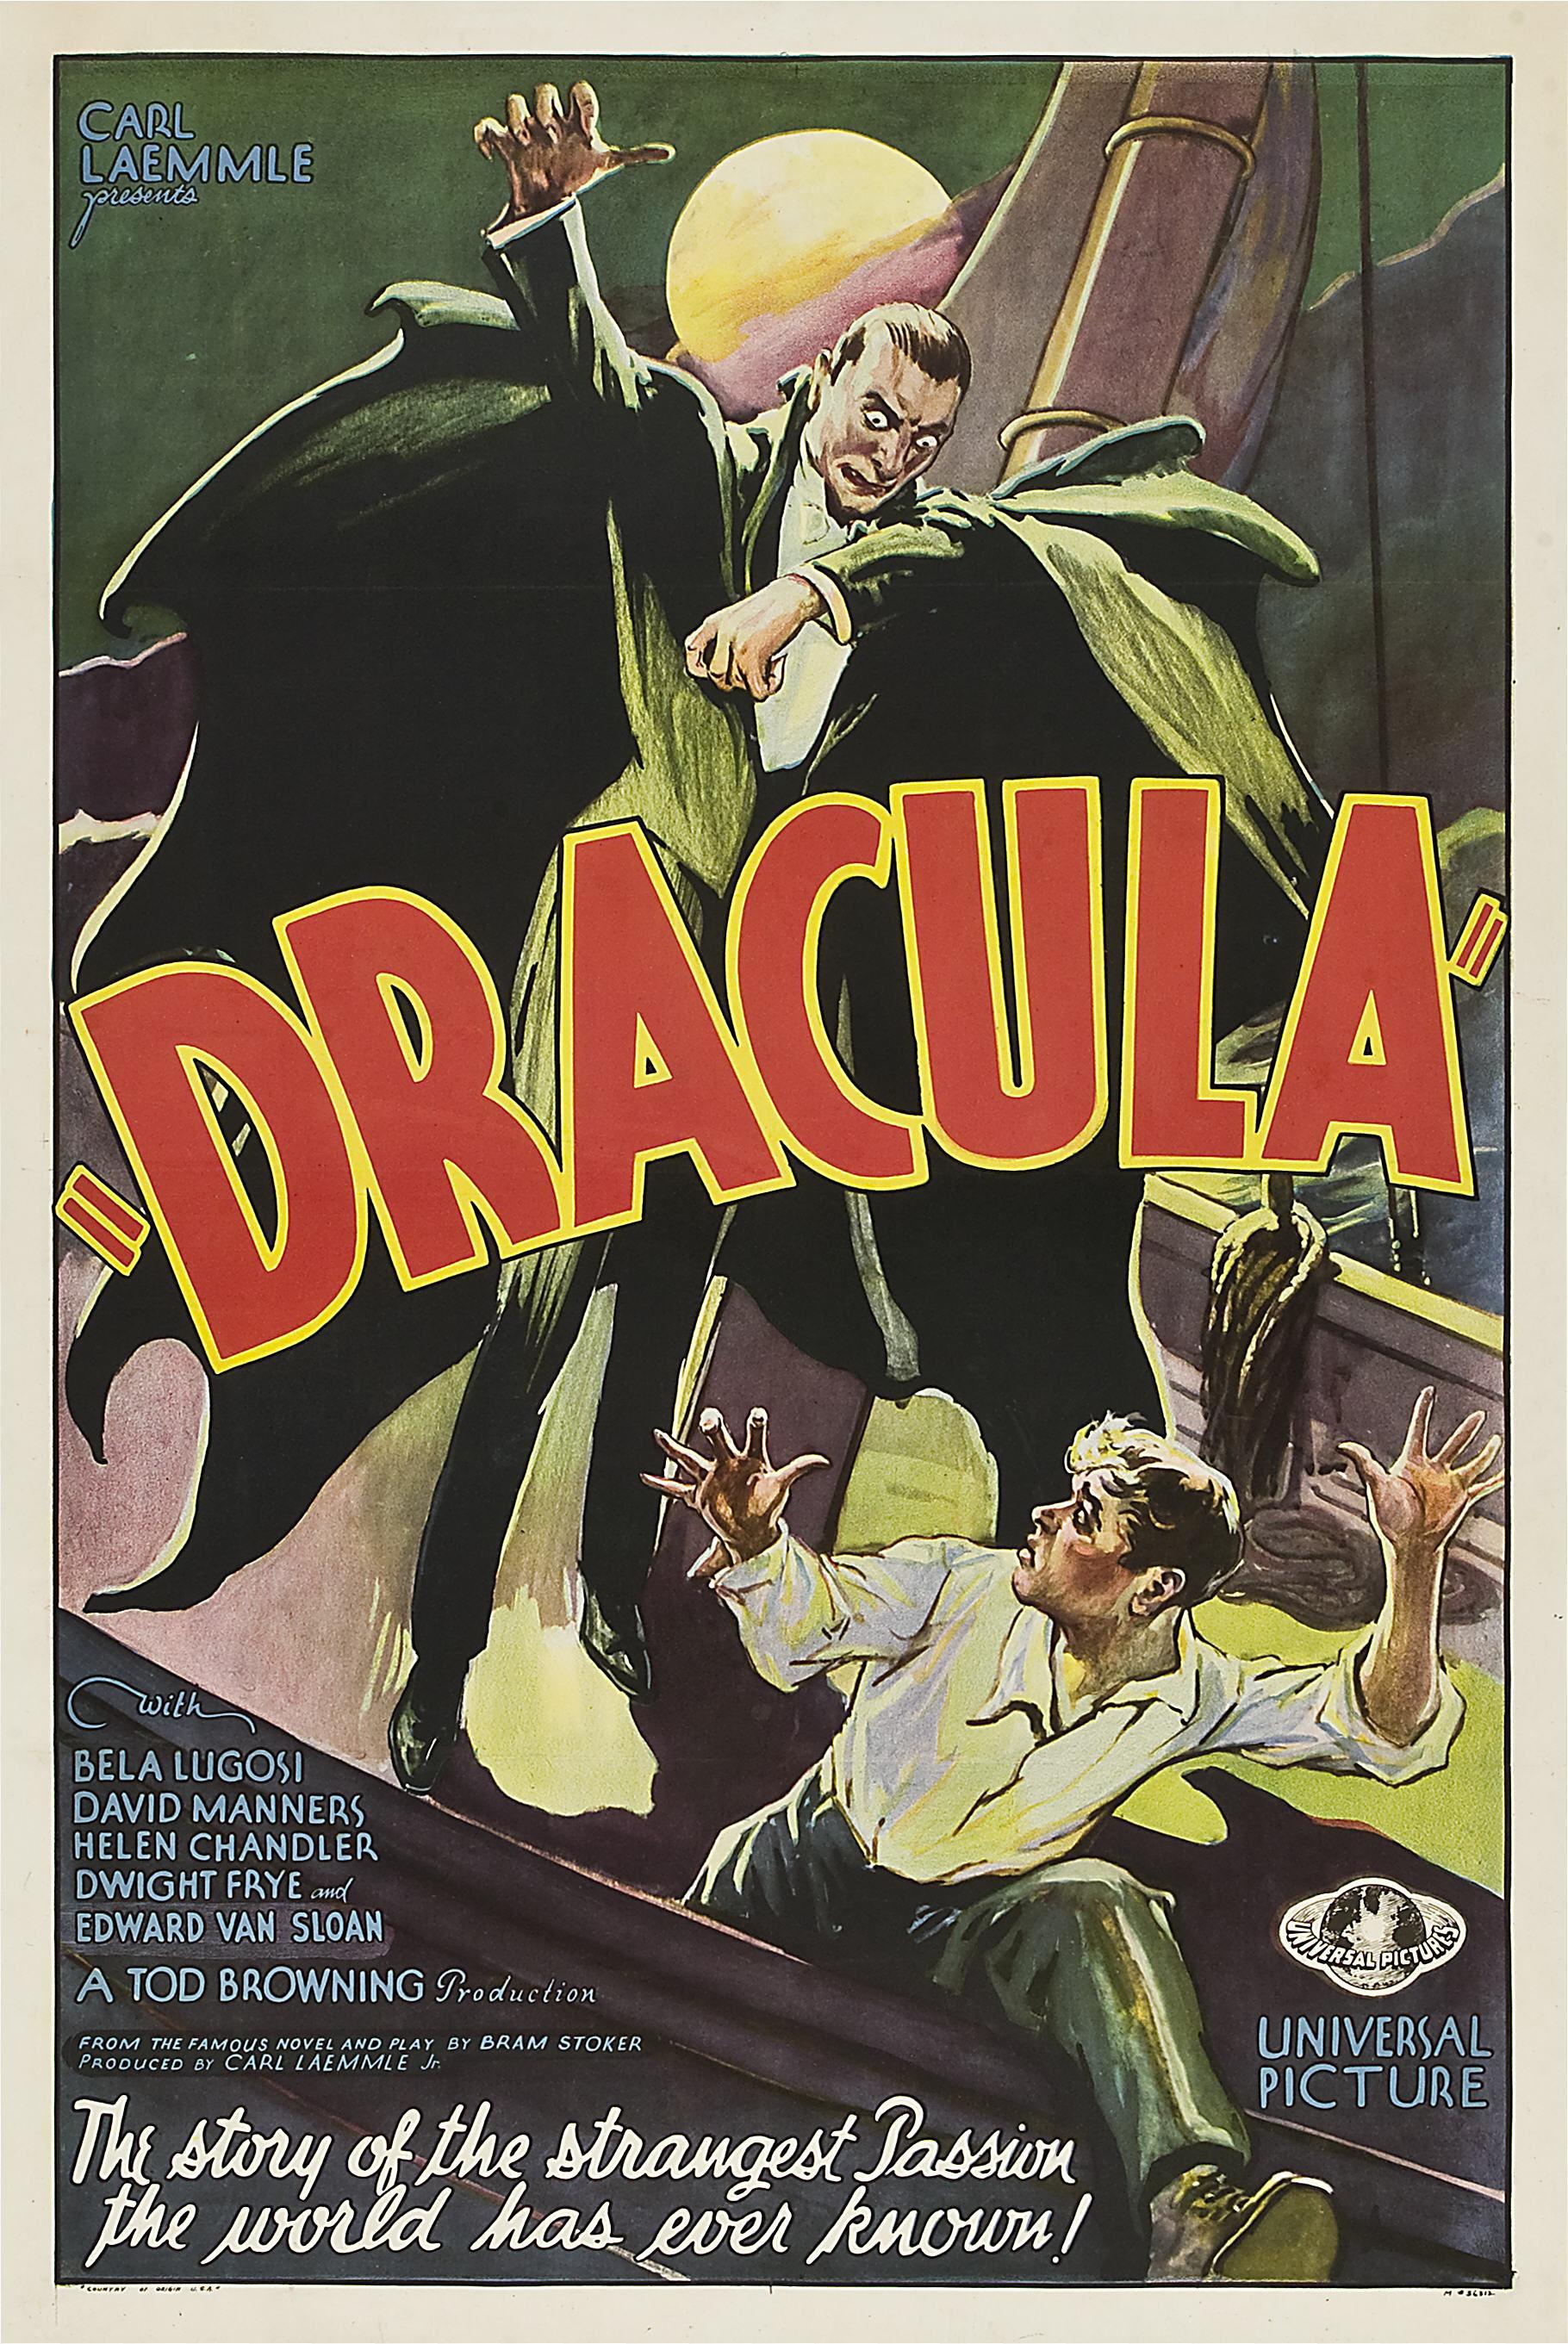 poster018-dracula-theredlist.jpg